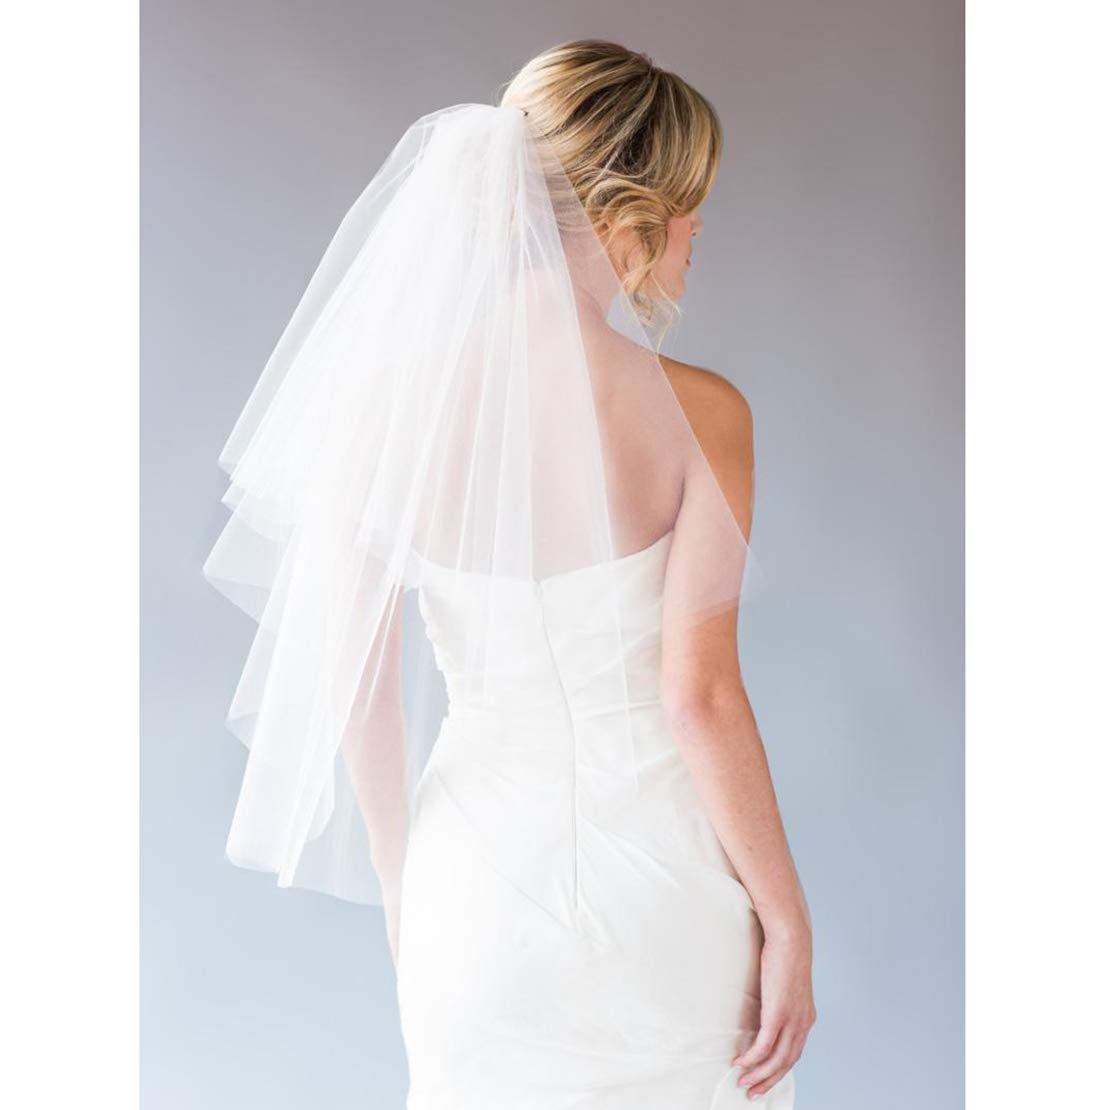 Fangsen Wedding Bridal Veil with Comb 2 Tier Tulle Short Wedding Veil Fingertip Length ( 2T Fingertip Light Ivory) by Fangsen